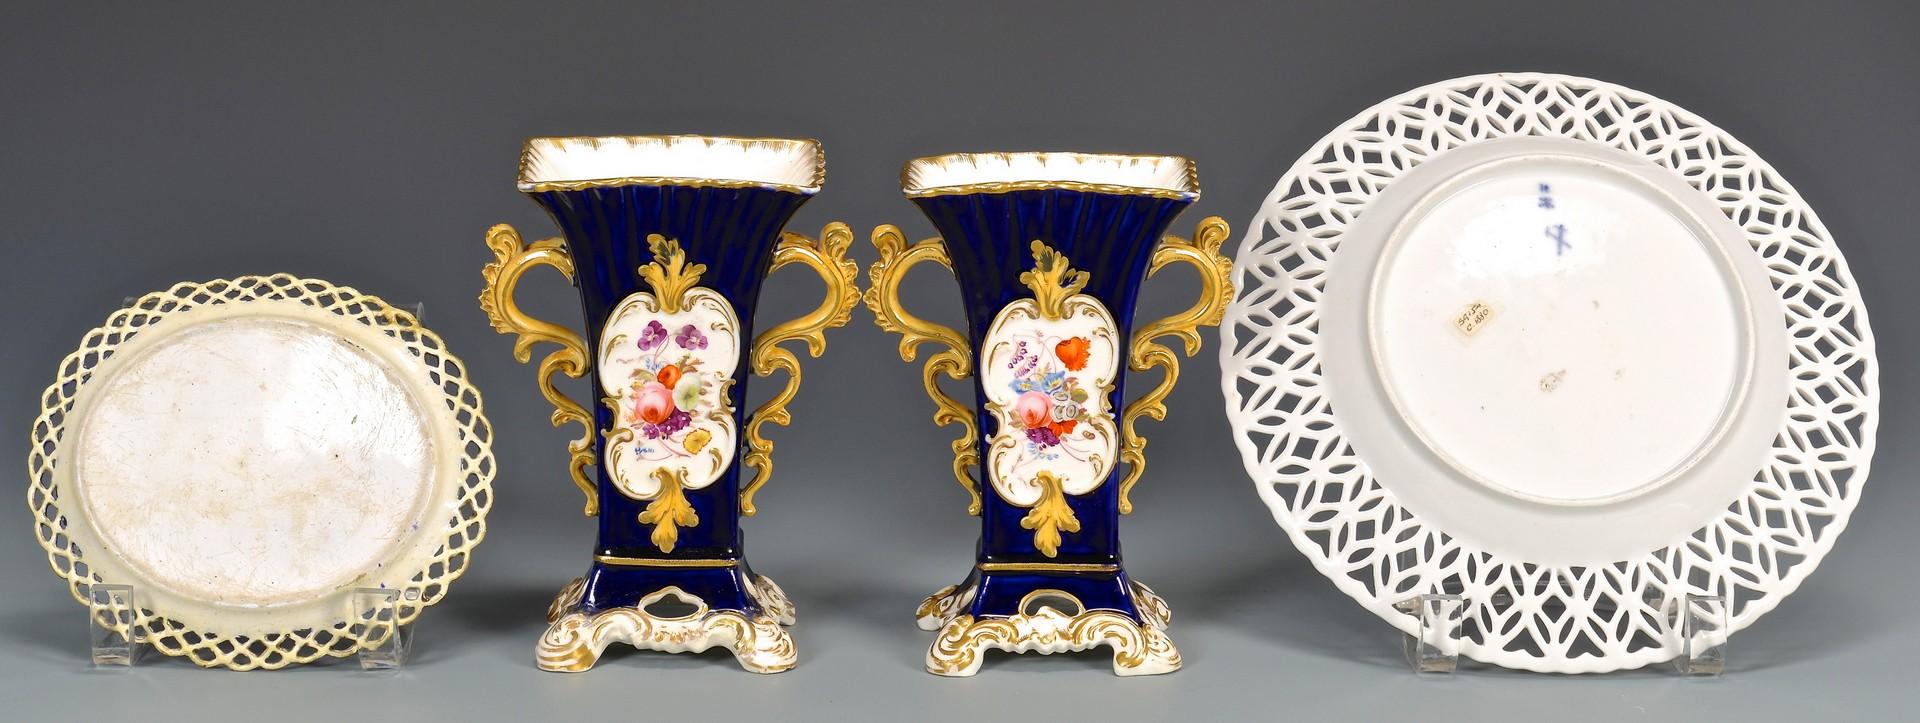 Lot 601: Large Grouping of European Porcelain